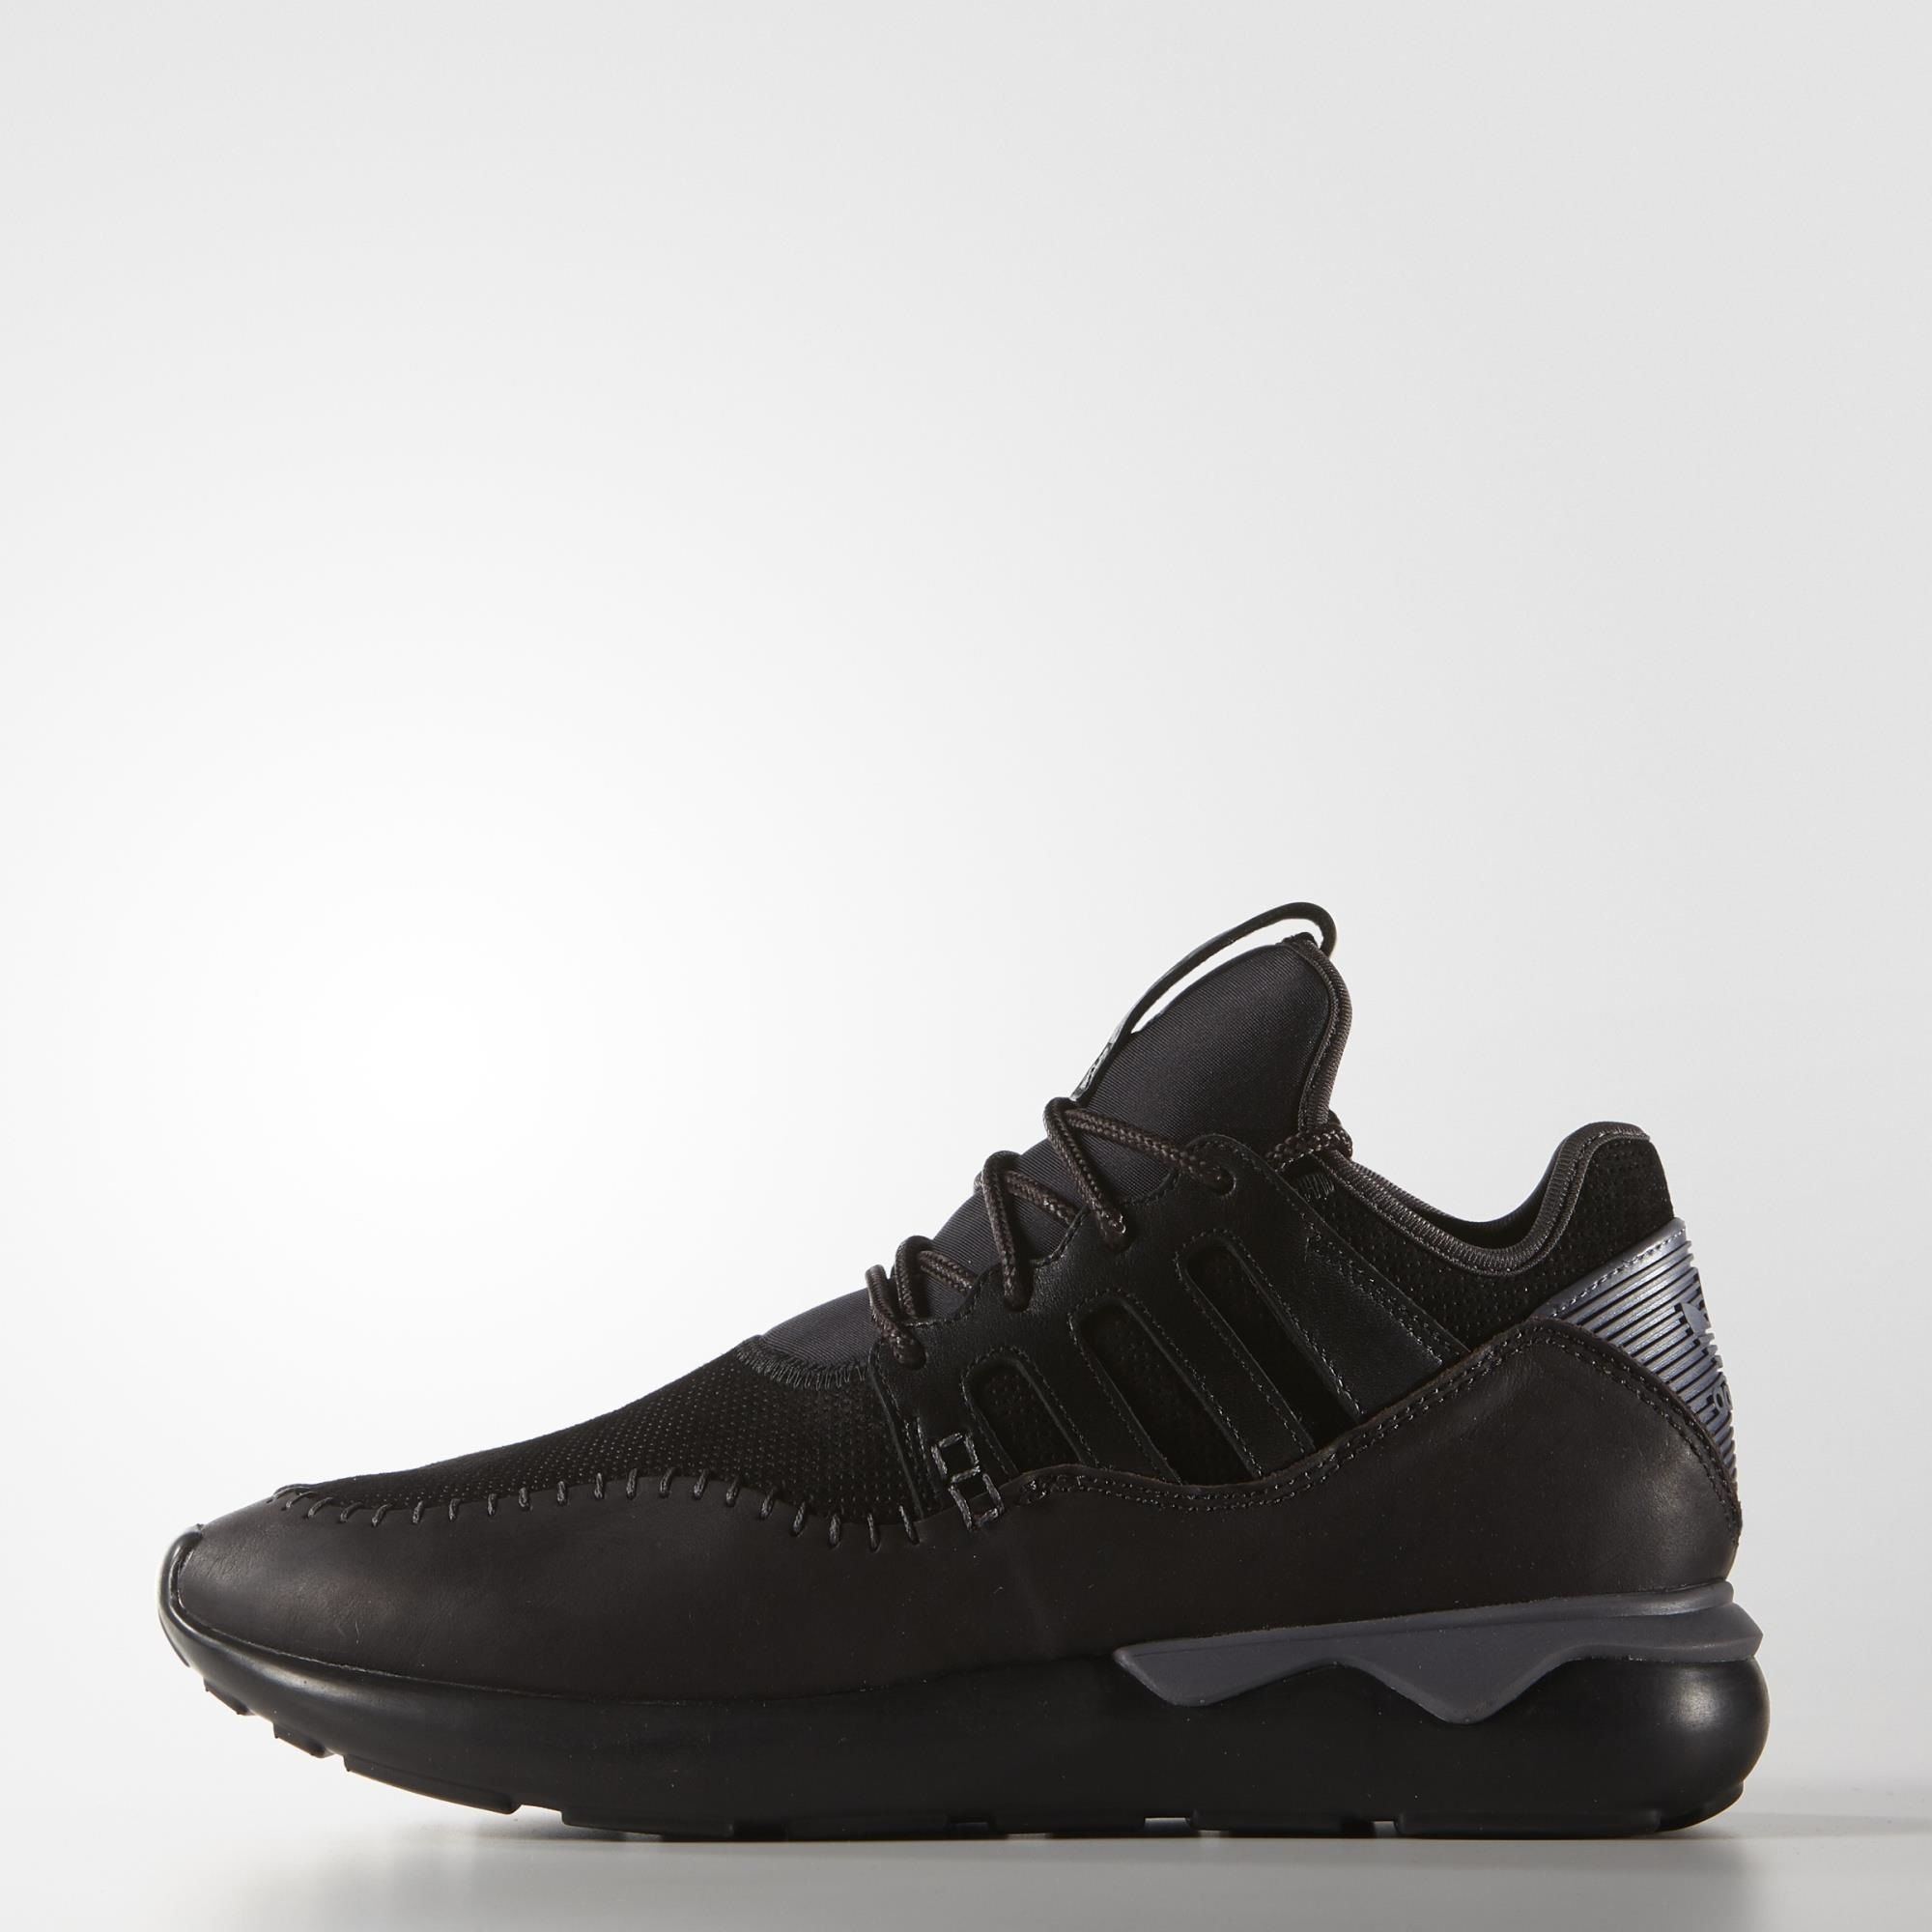 adidas Tubular Moc Runner Shoes - Black | adidas US